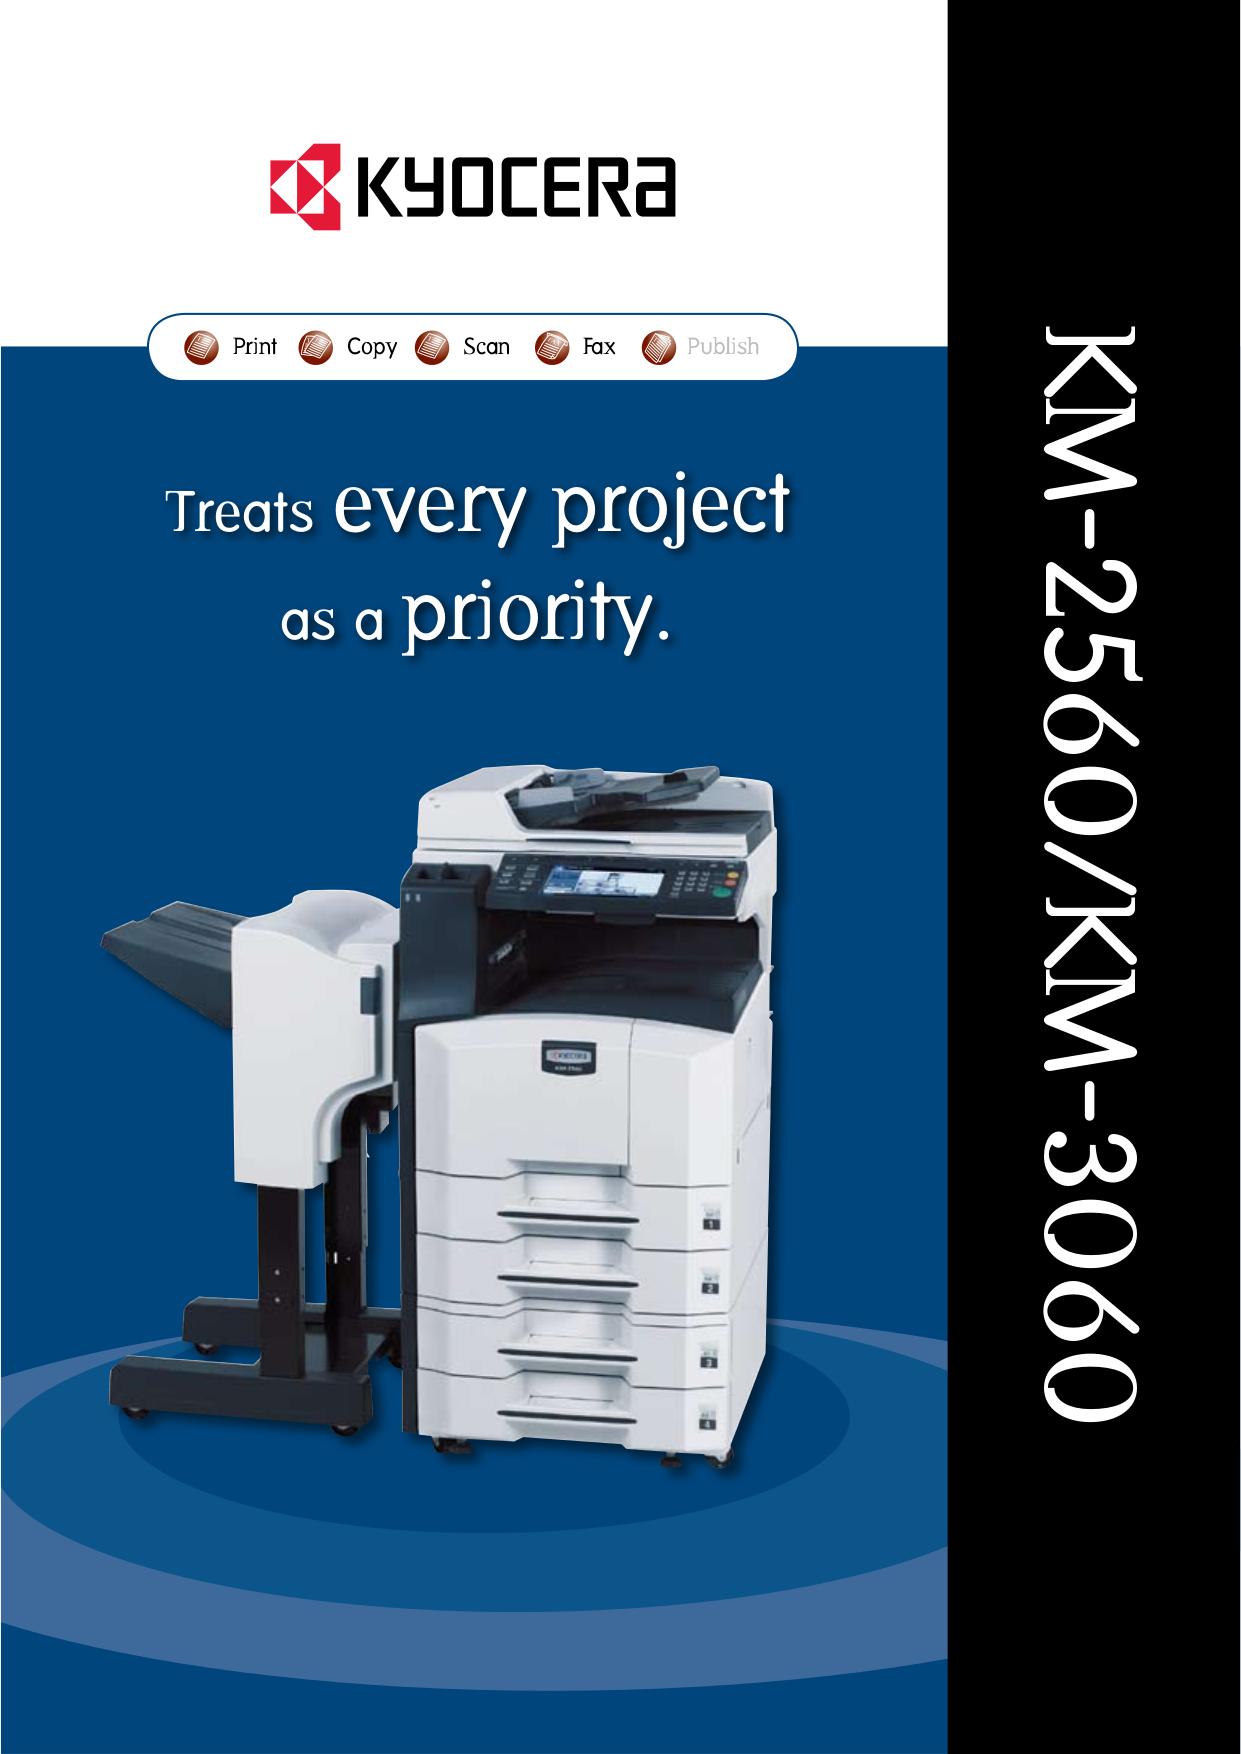 Kyocera Km c2525e manual